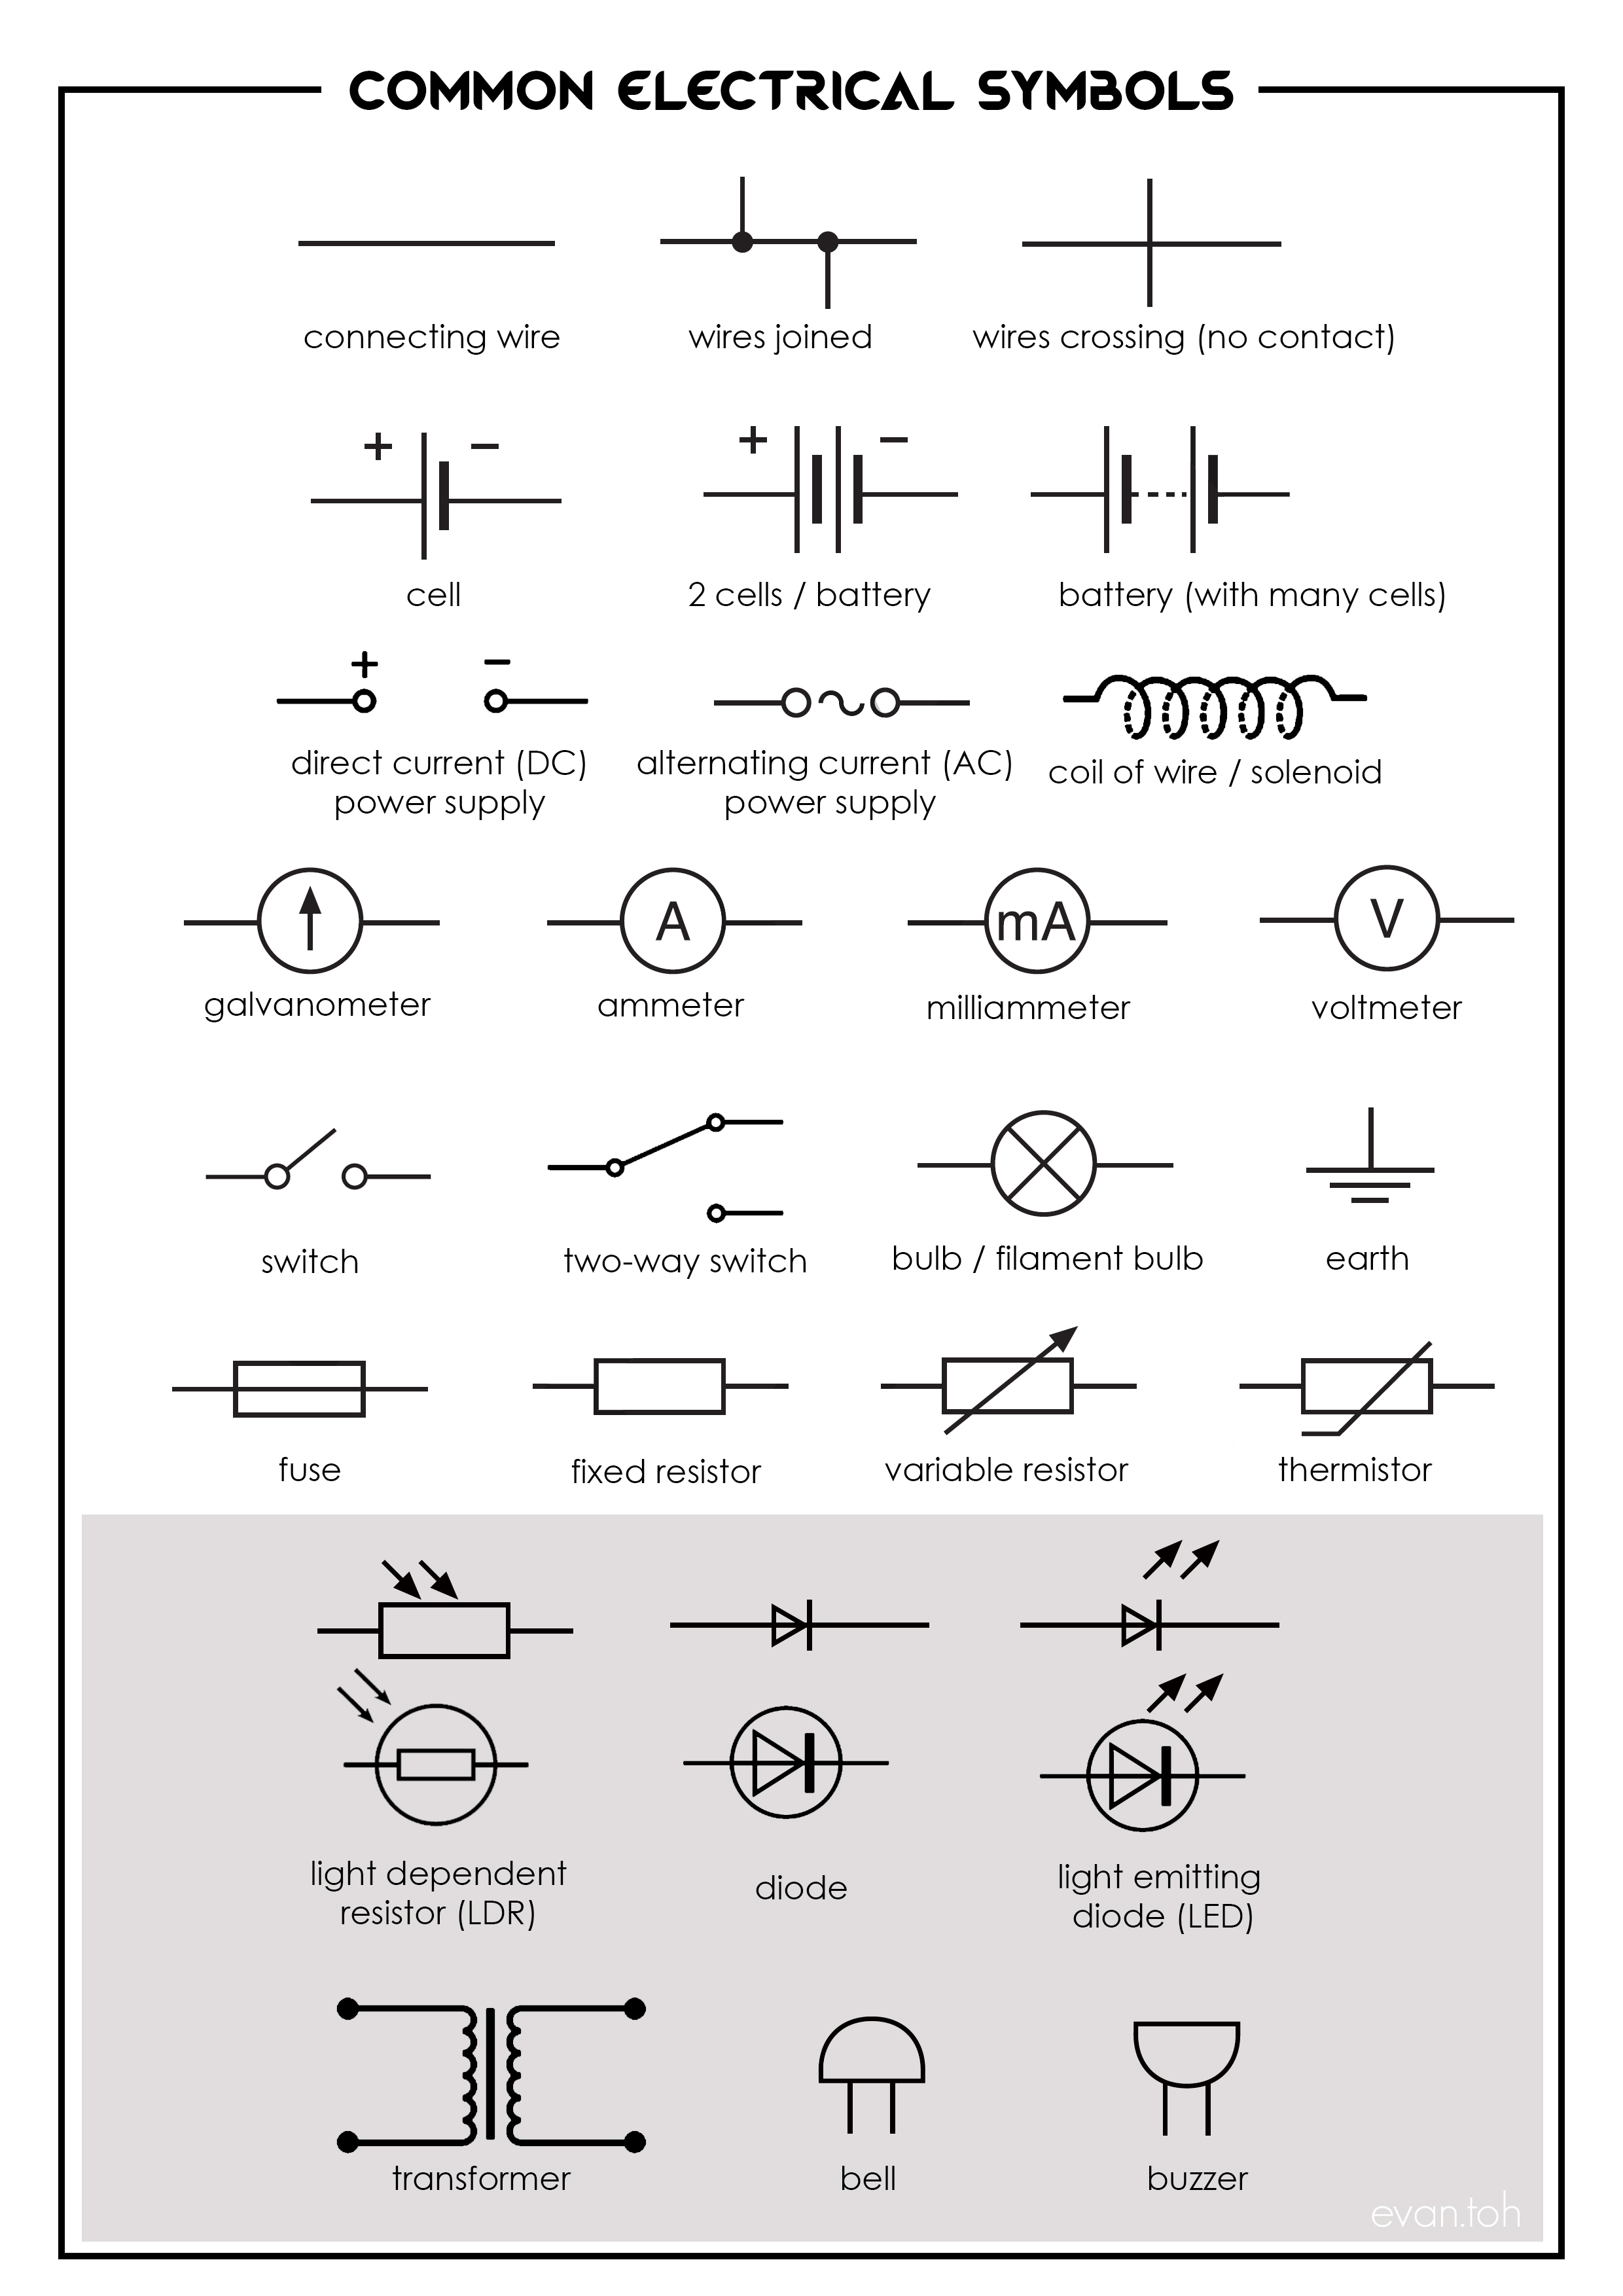 medium resolution of common electrical symbols evan u0027s spacedc wiring symbols 4